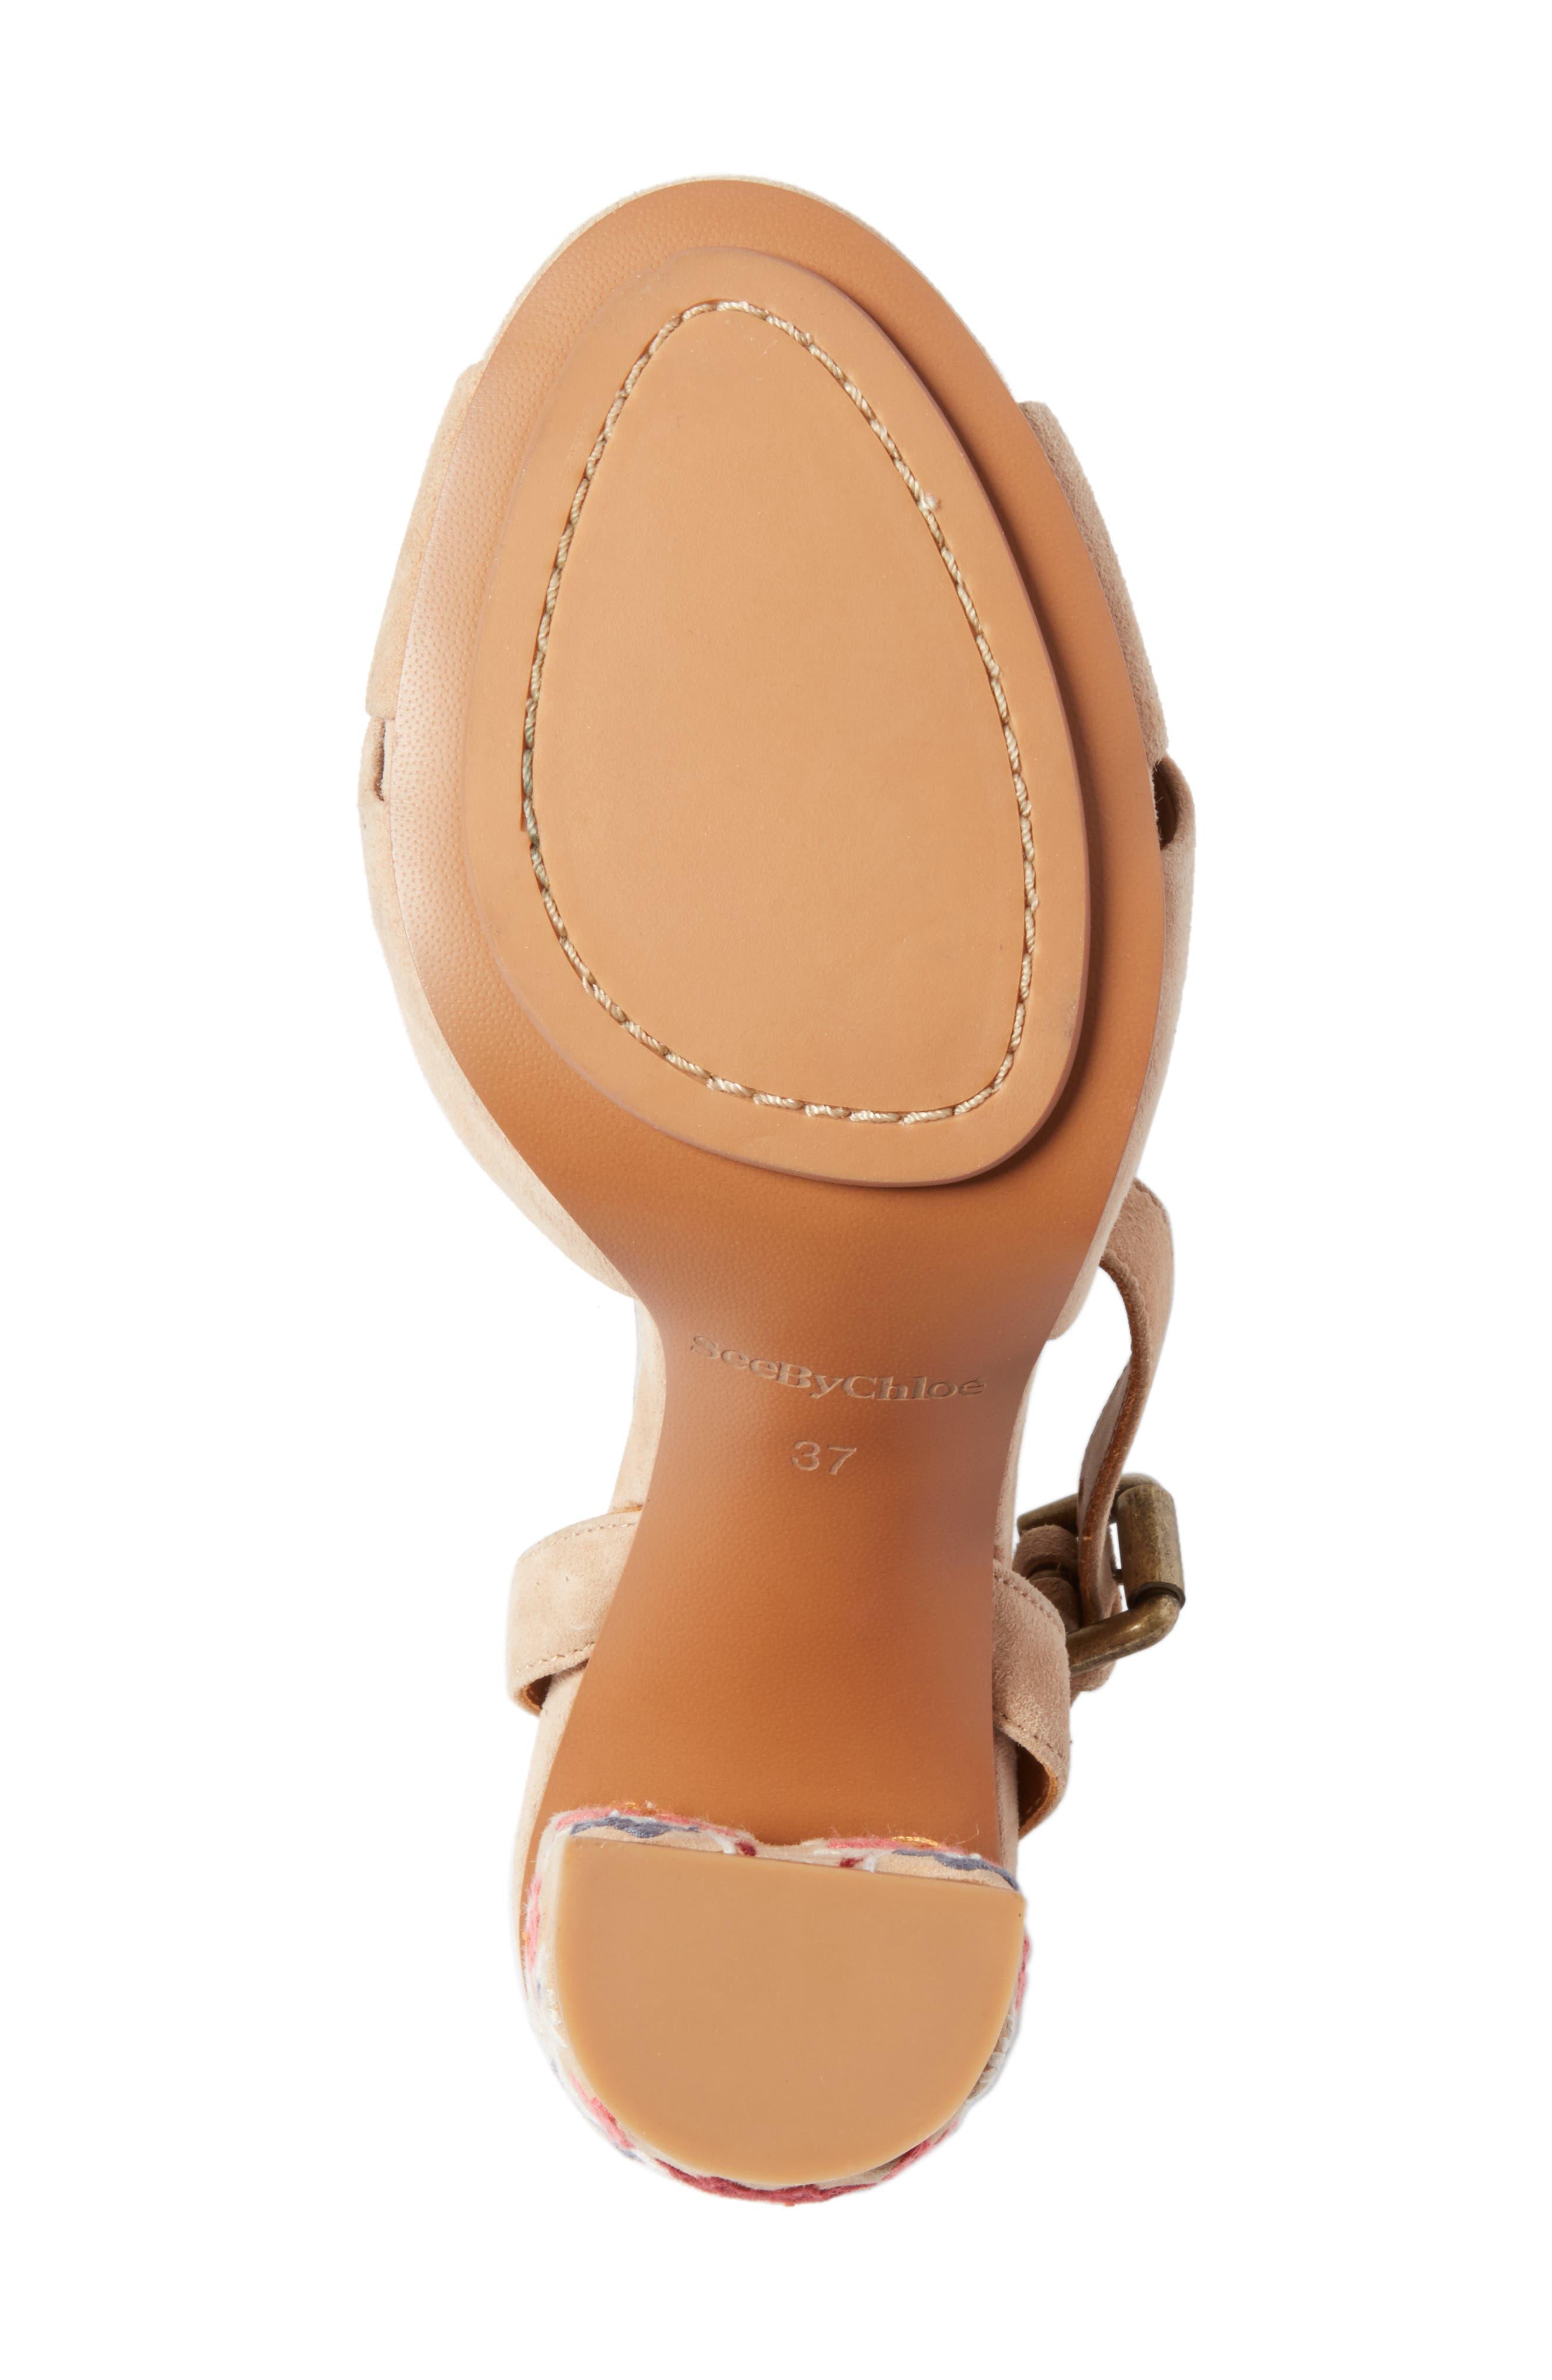 Gayla Embroidered Block Heel Sandal,                             Alternate thumbnail 6, color,                             Nude